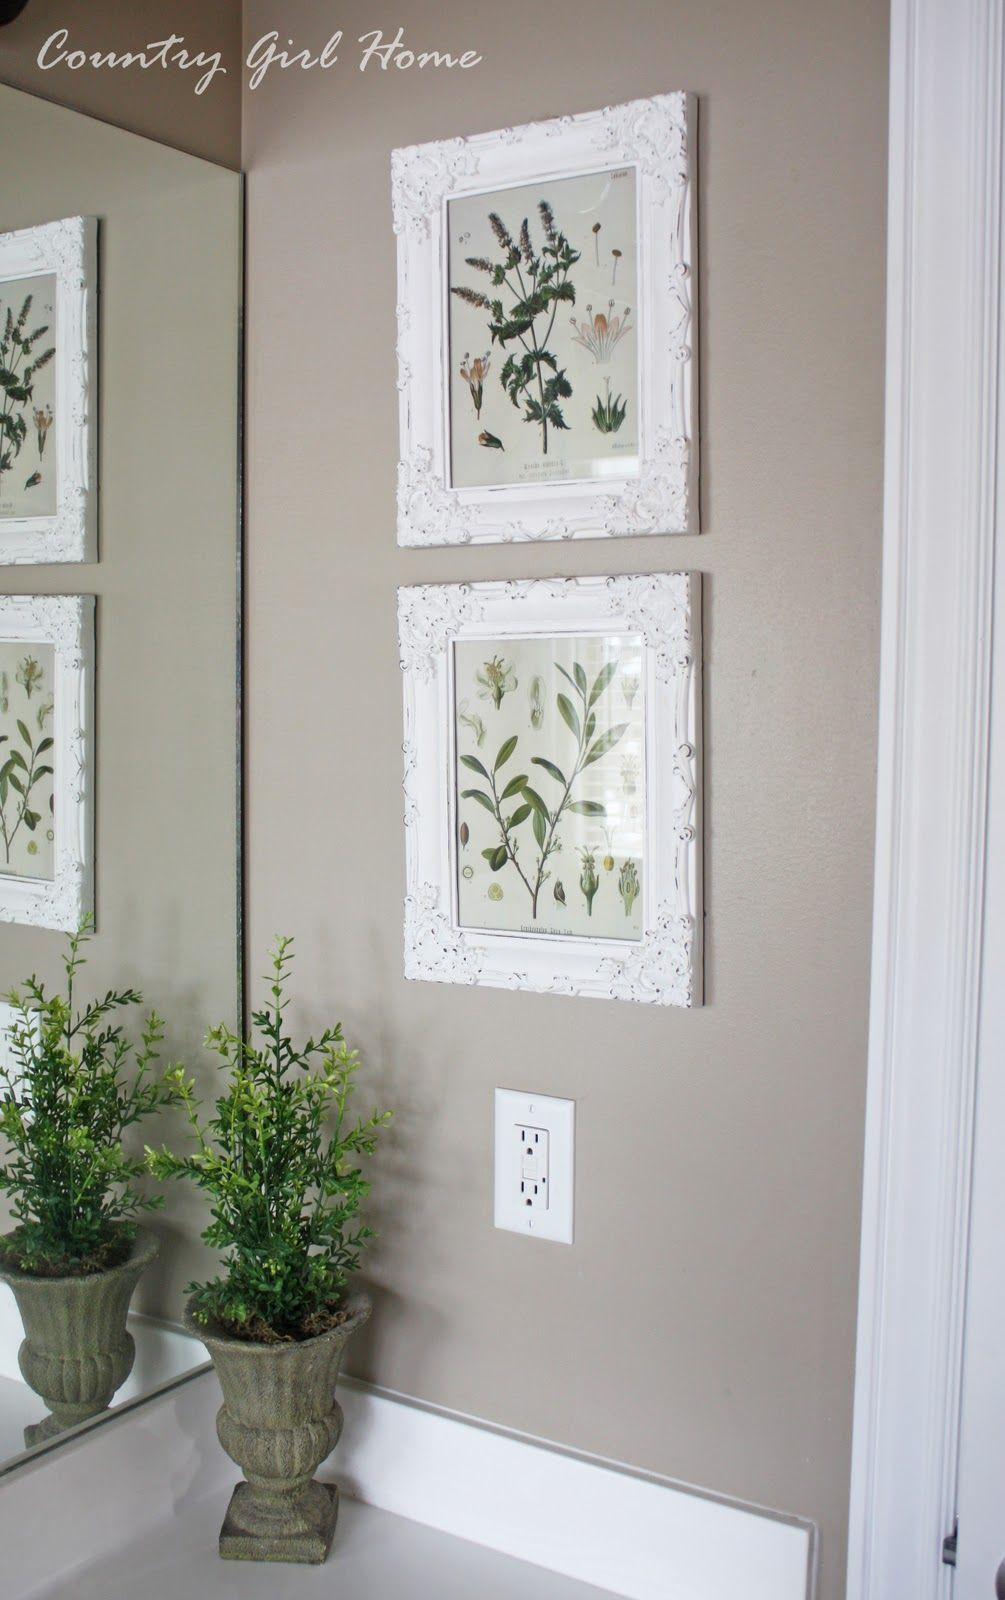 COUNTRY GIRL HOME: Free Botanical Printable Art   Craft ideas ...